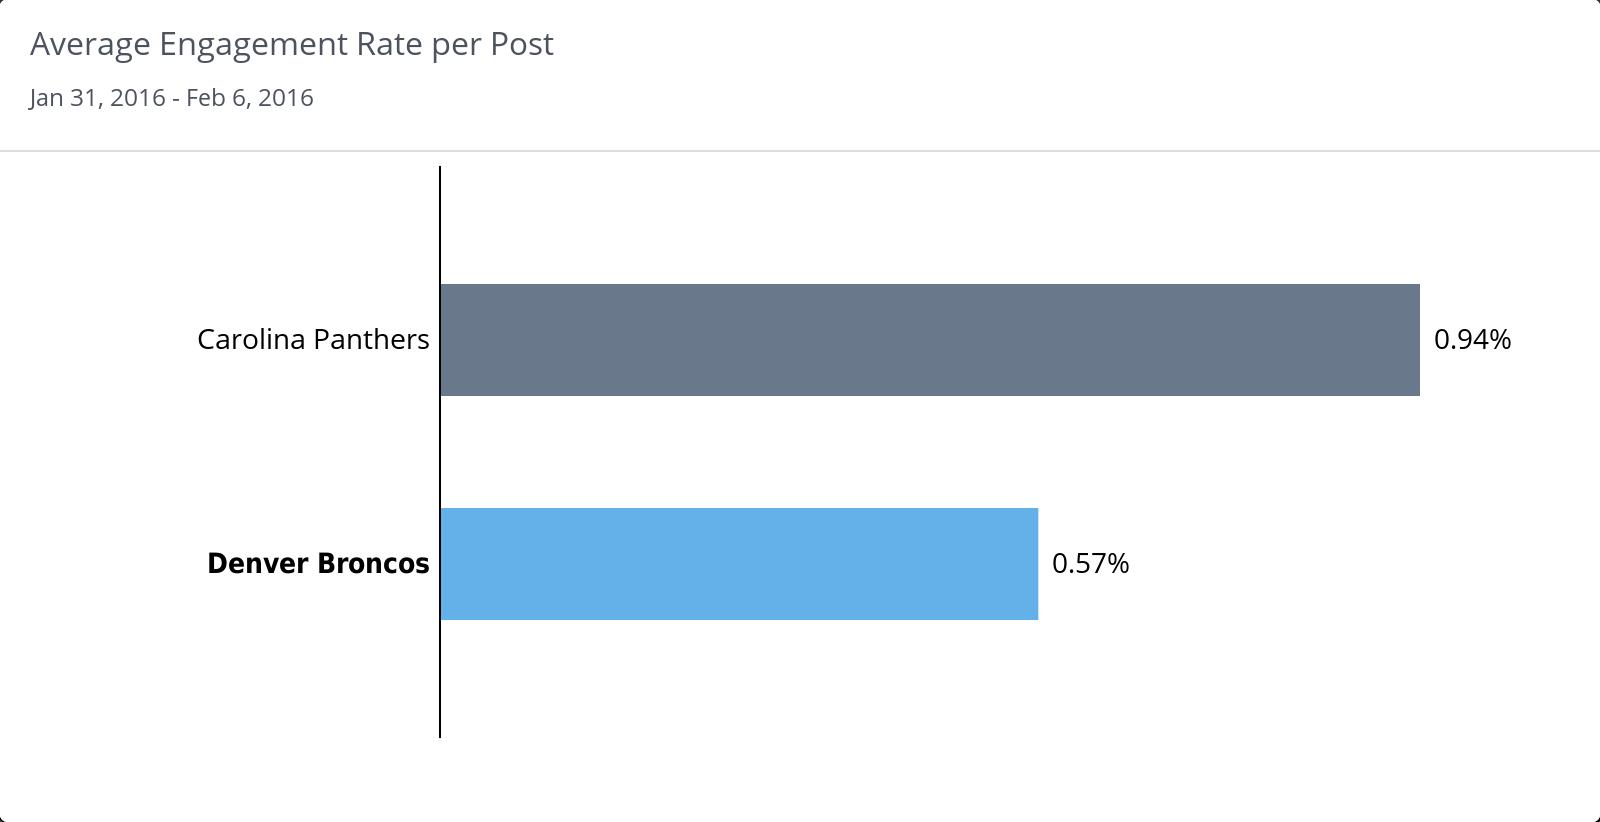 Average Engagement Rate Super Bowl 50